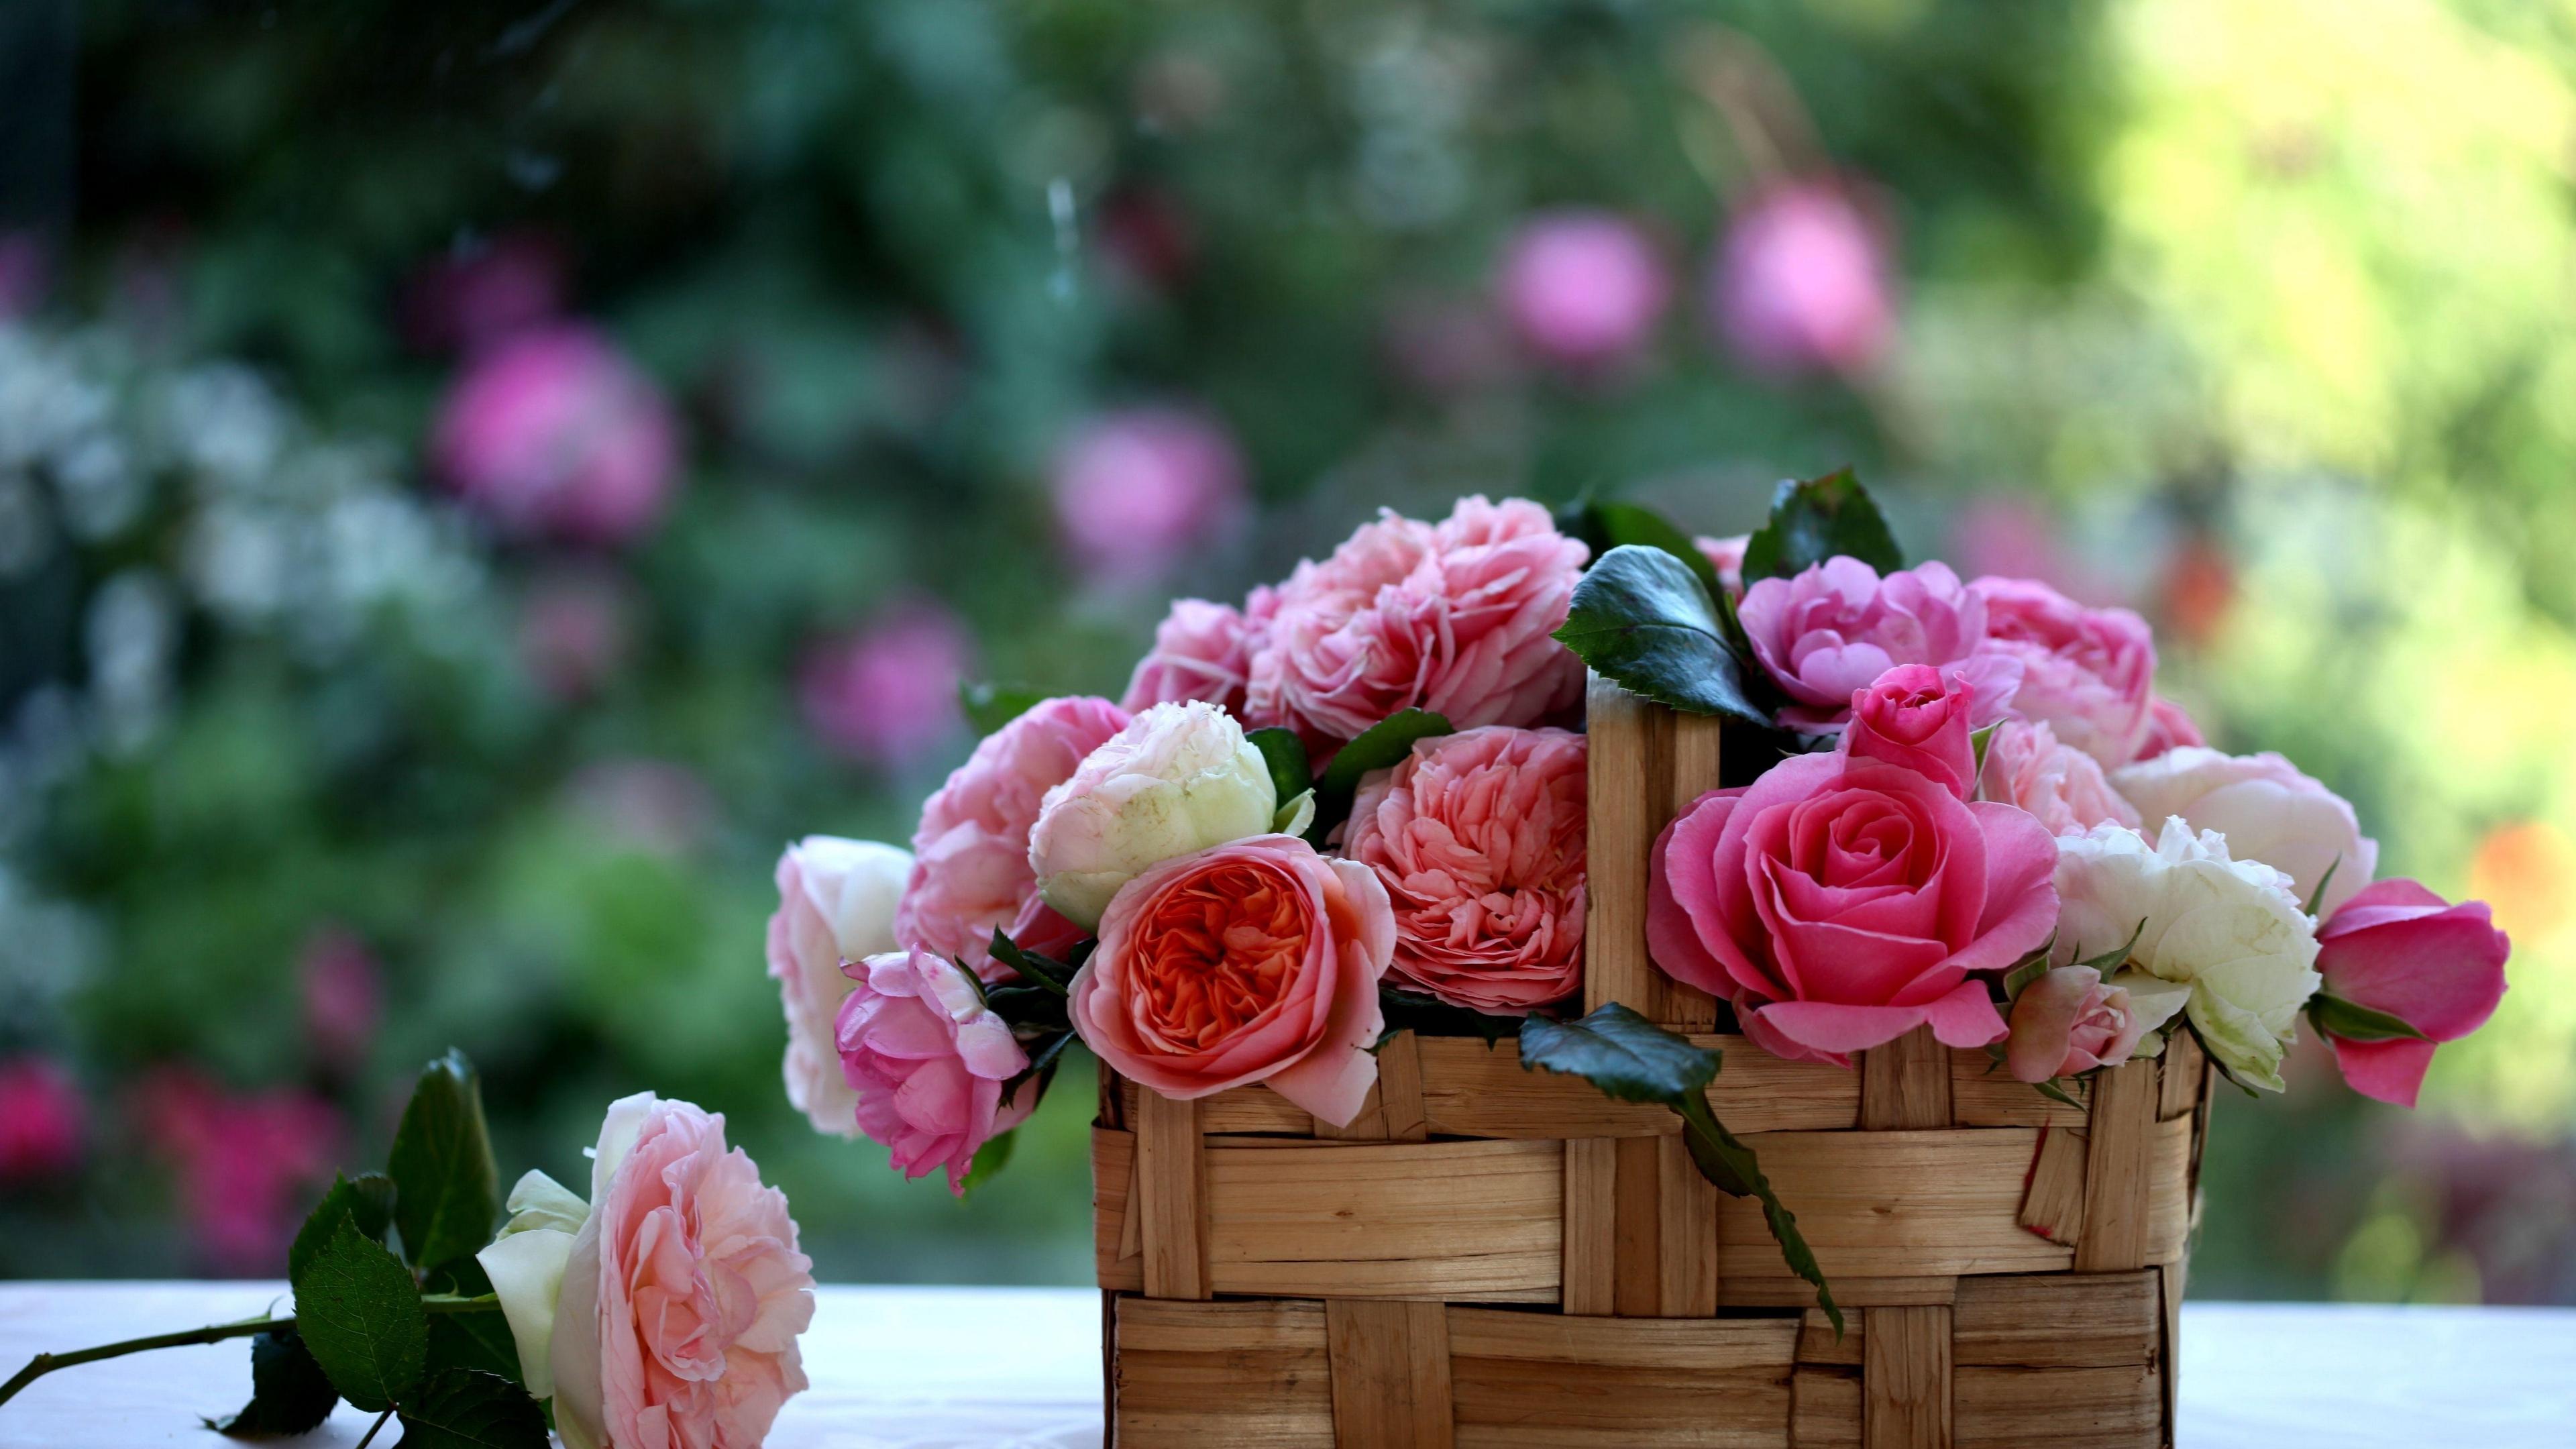 rose flowers buds basket blurring 4k 1540065054 - rose, flowers, buds, basket, blurring 4k - Rose, Flowers, Buds